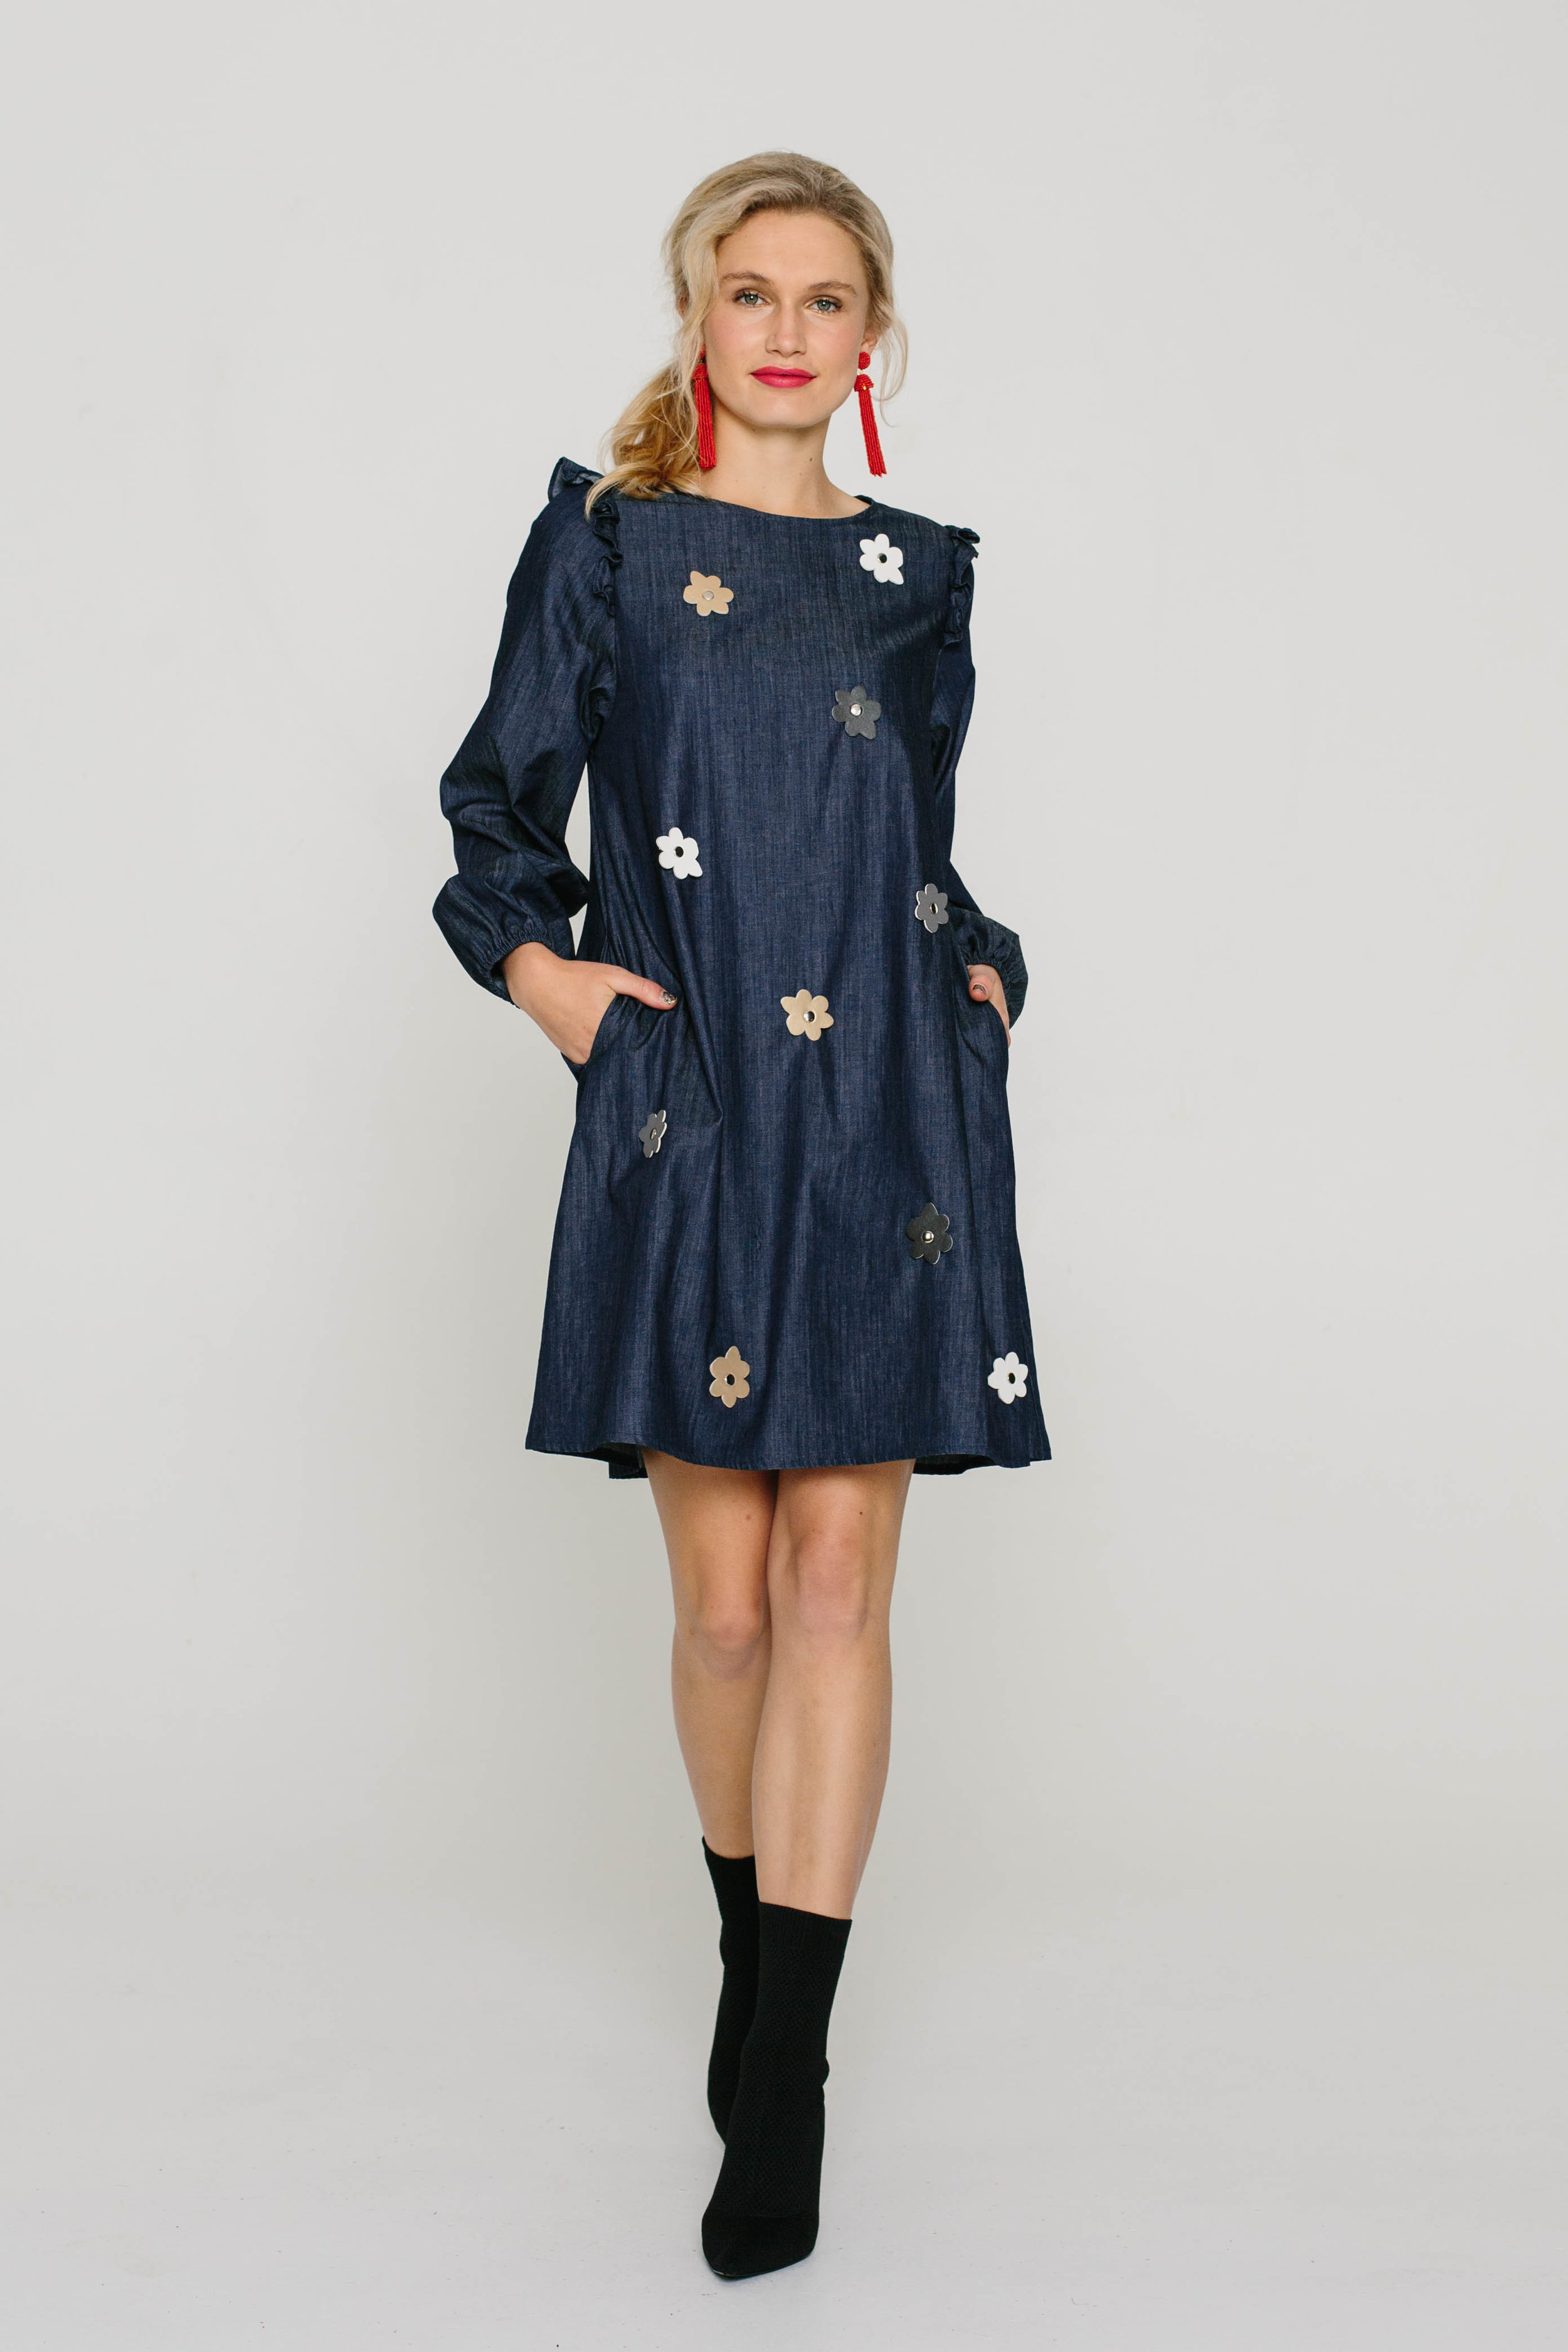 6130W Stevie Dress Blue